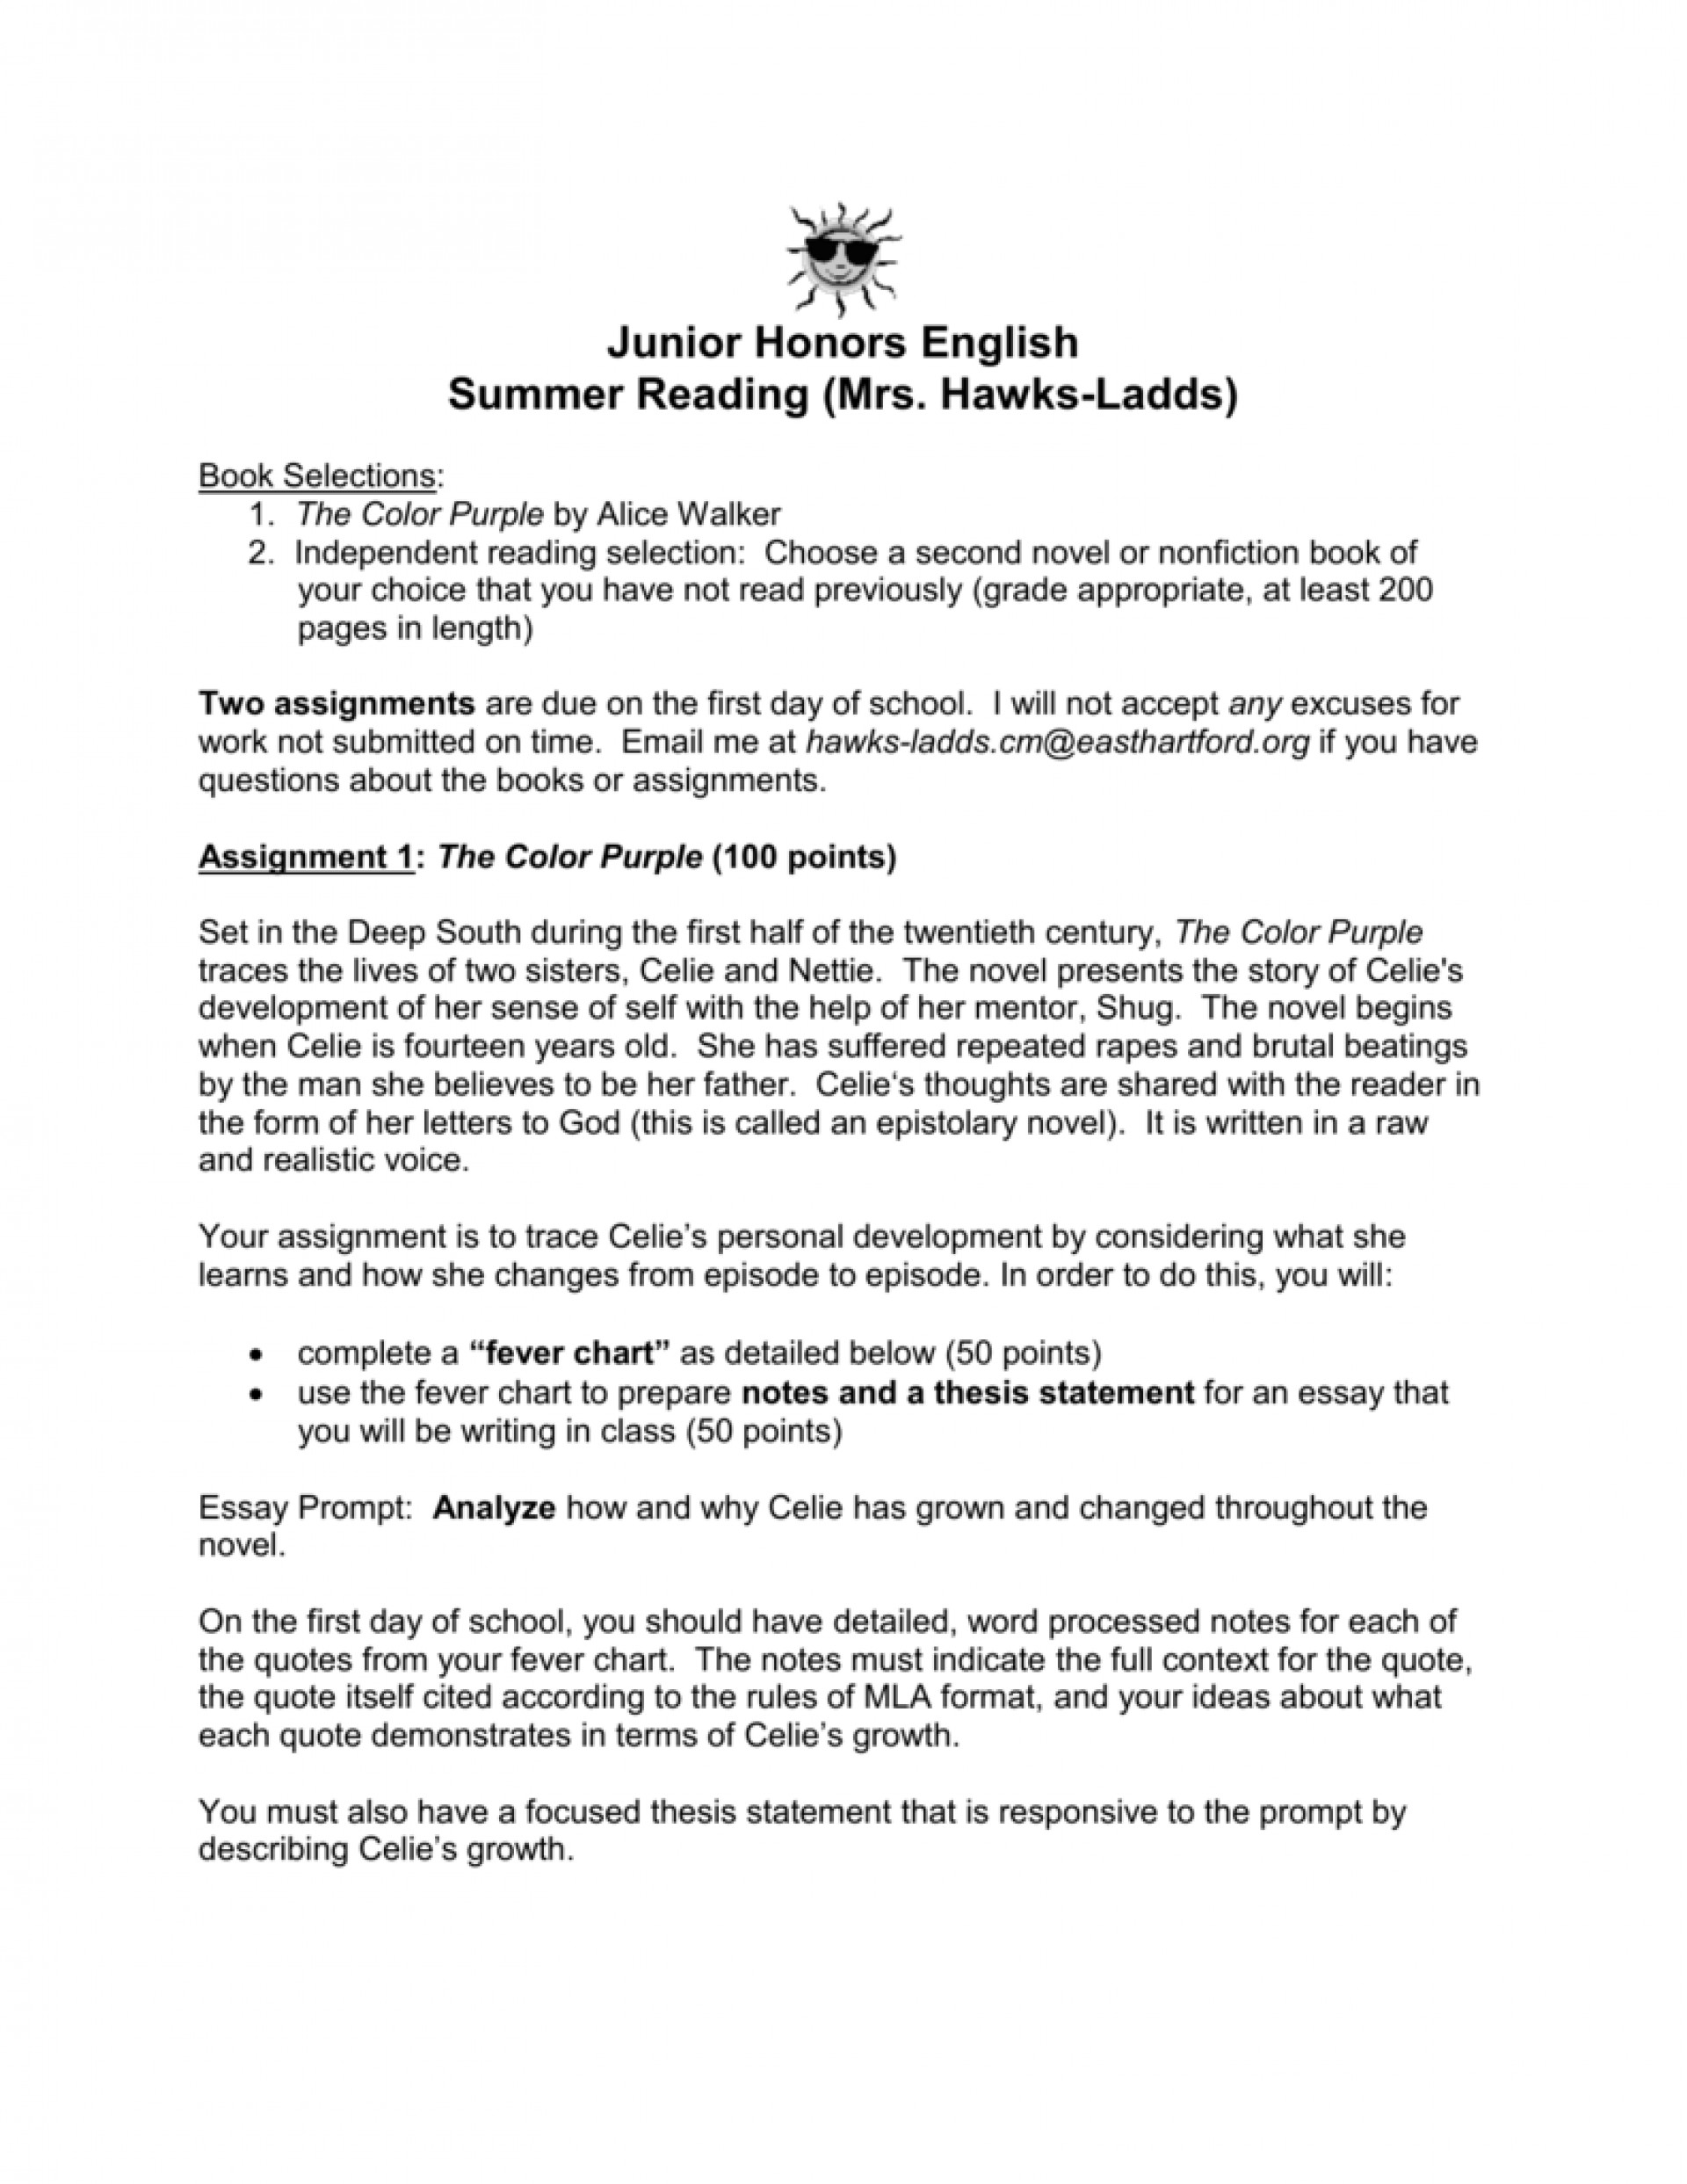 001 The Color Purple Essay 009259708 1 Impressive Research Paper Outline Introduction 1920